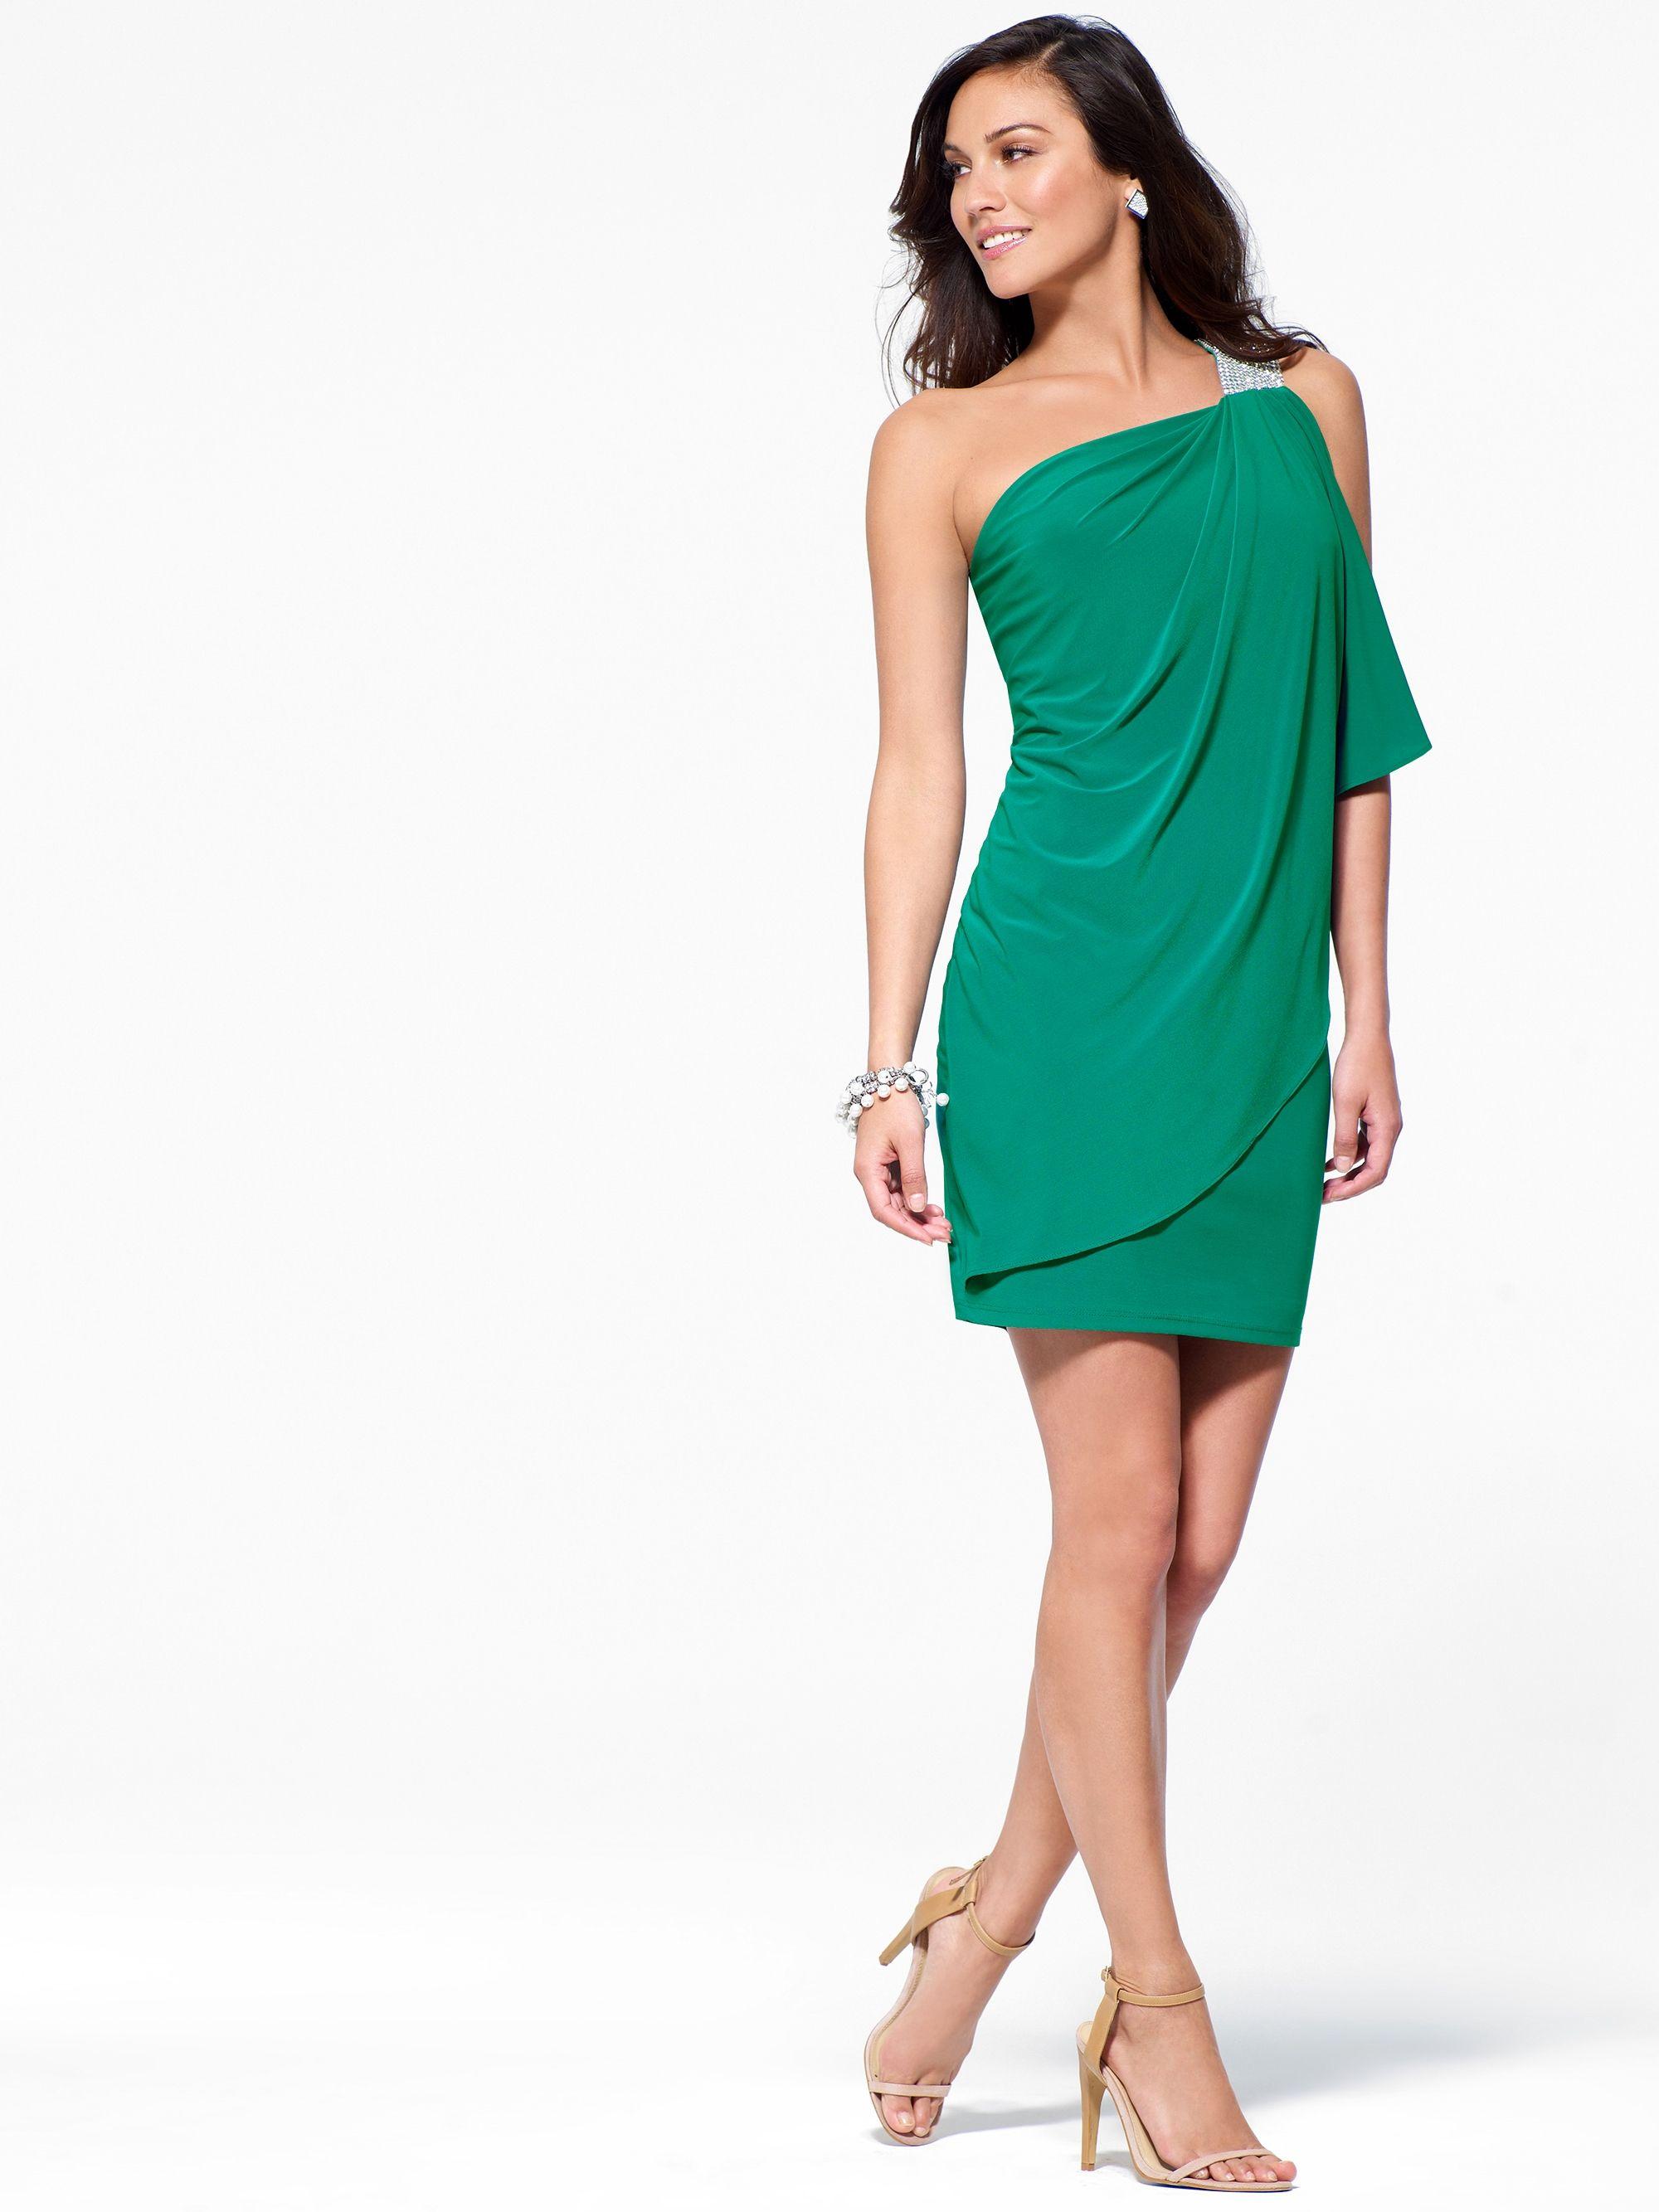 COCKTAIL DRESSES | Green One Shoulder Dress With Rhinestone Trim ...